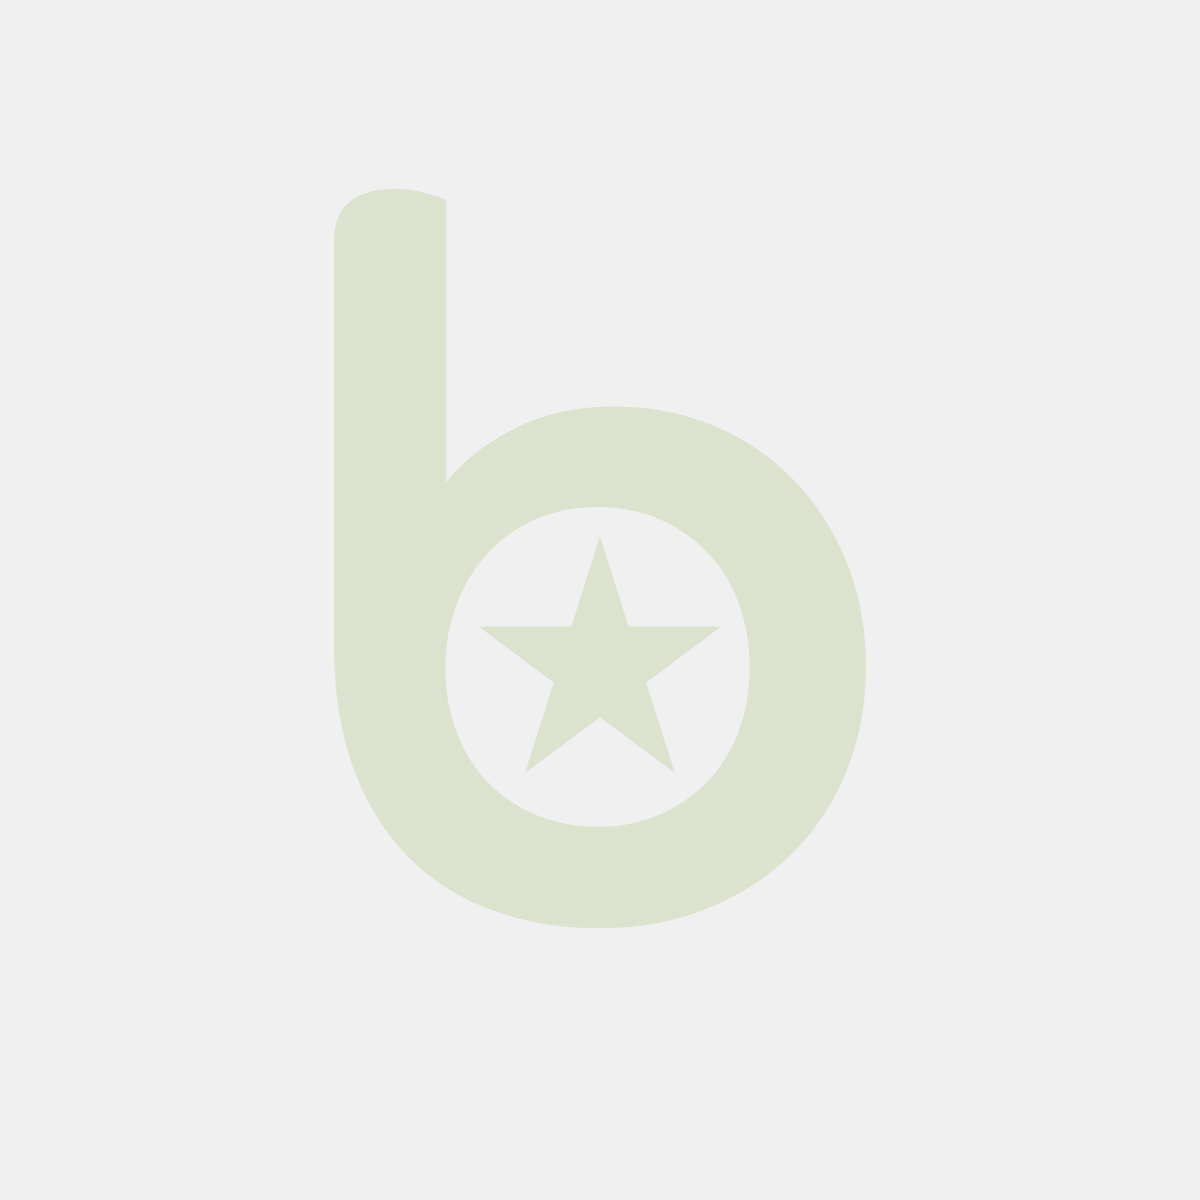 Taśma pakowa VIBAC Solvent, 48mm, 60m, brązowa